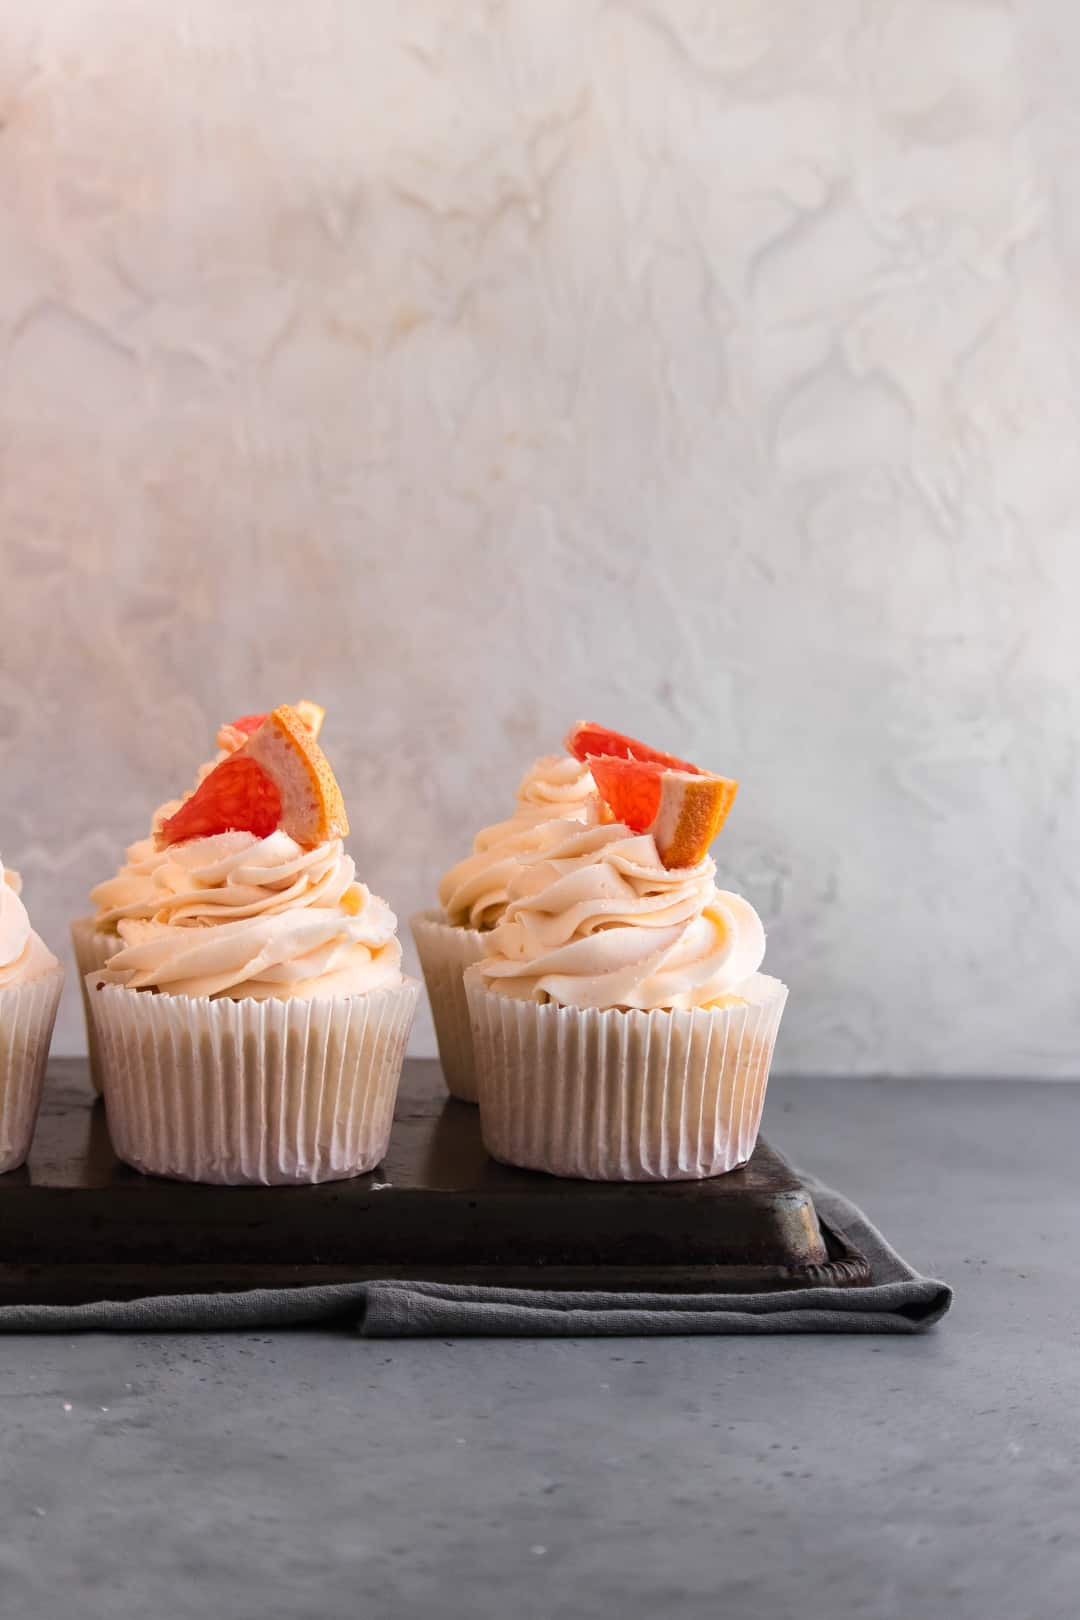 Vanilla Cupcakes with Grapefruit buttercream